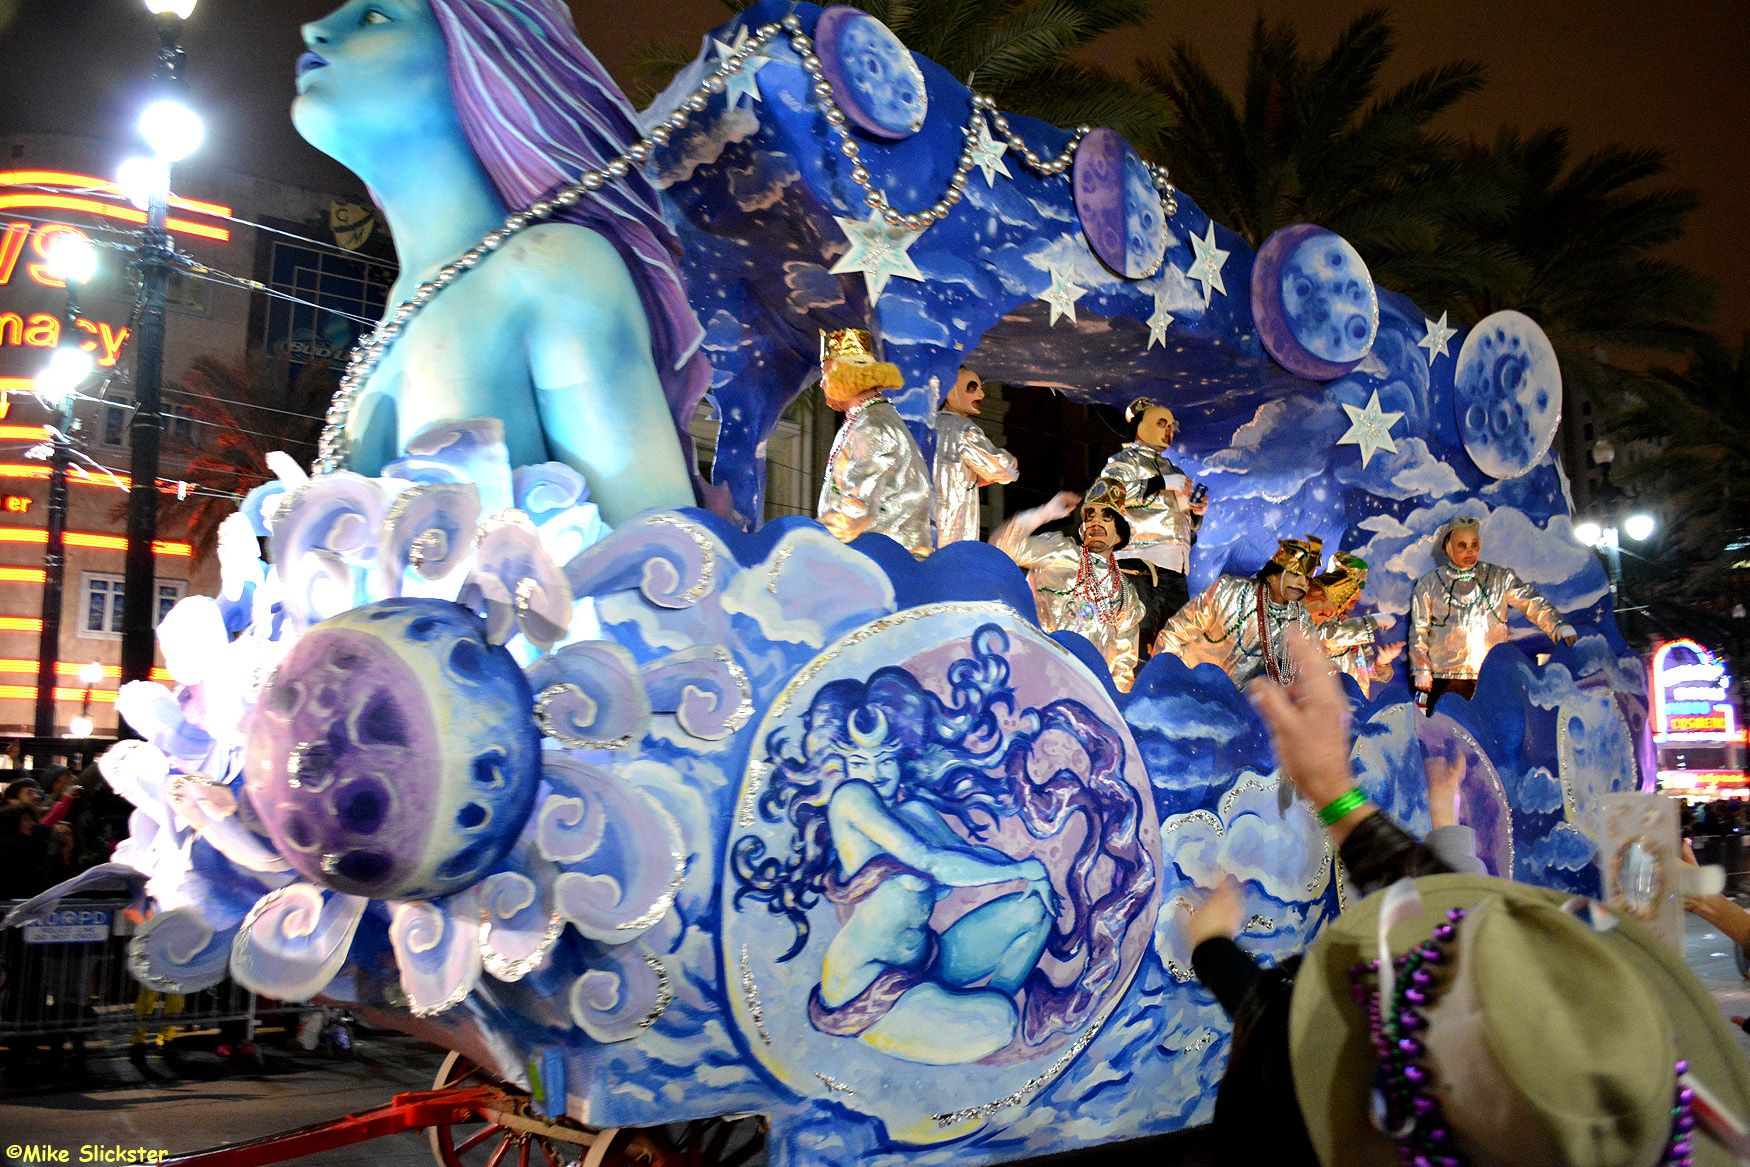 krewe of orpheus parade float new orleans mardi gras